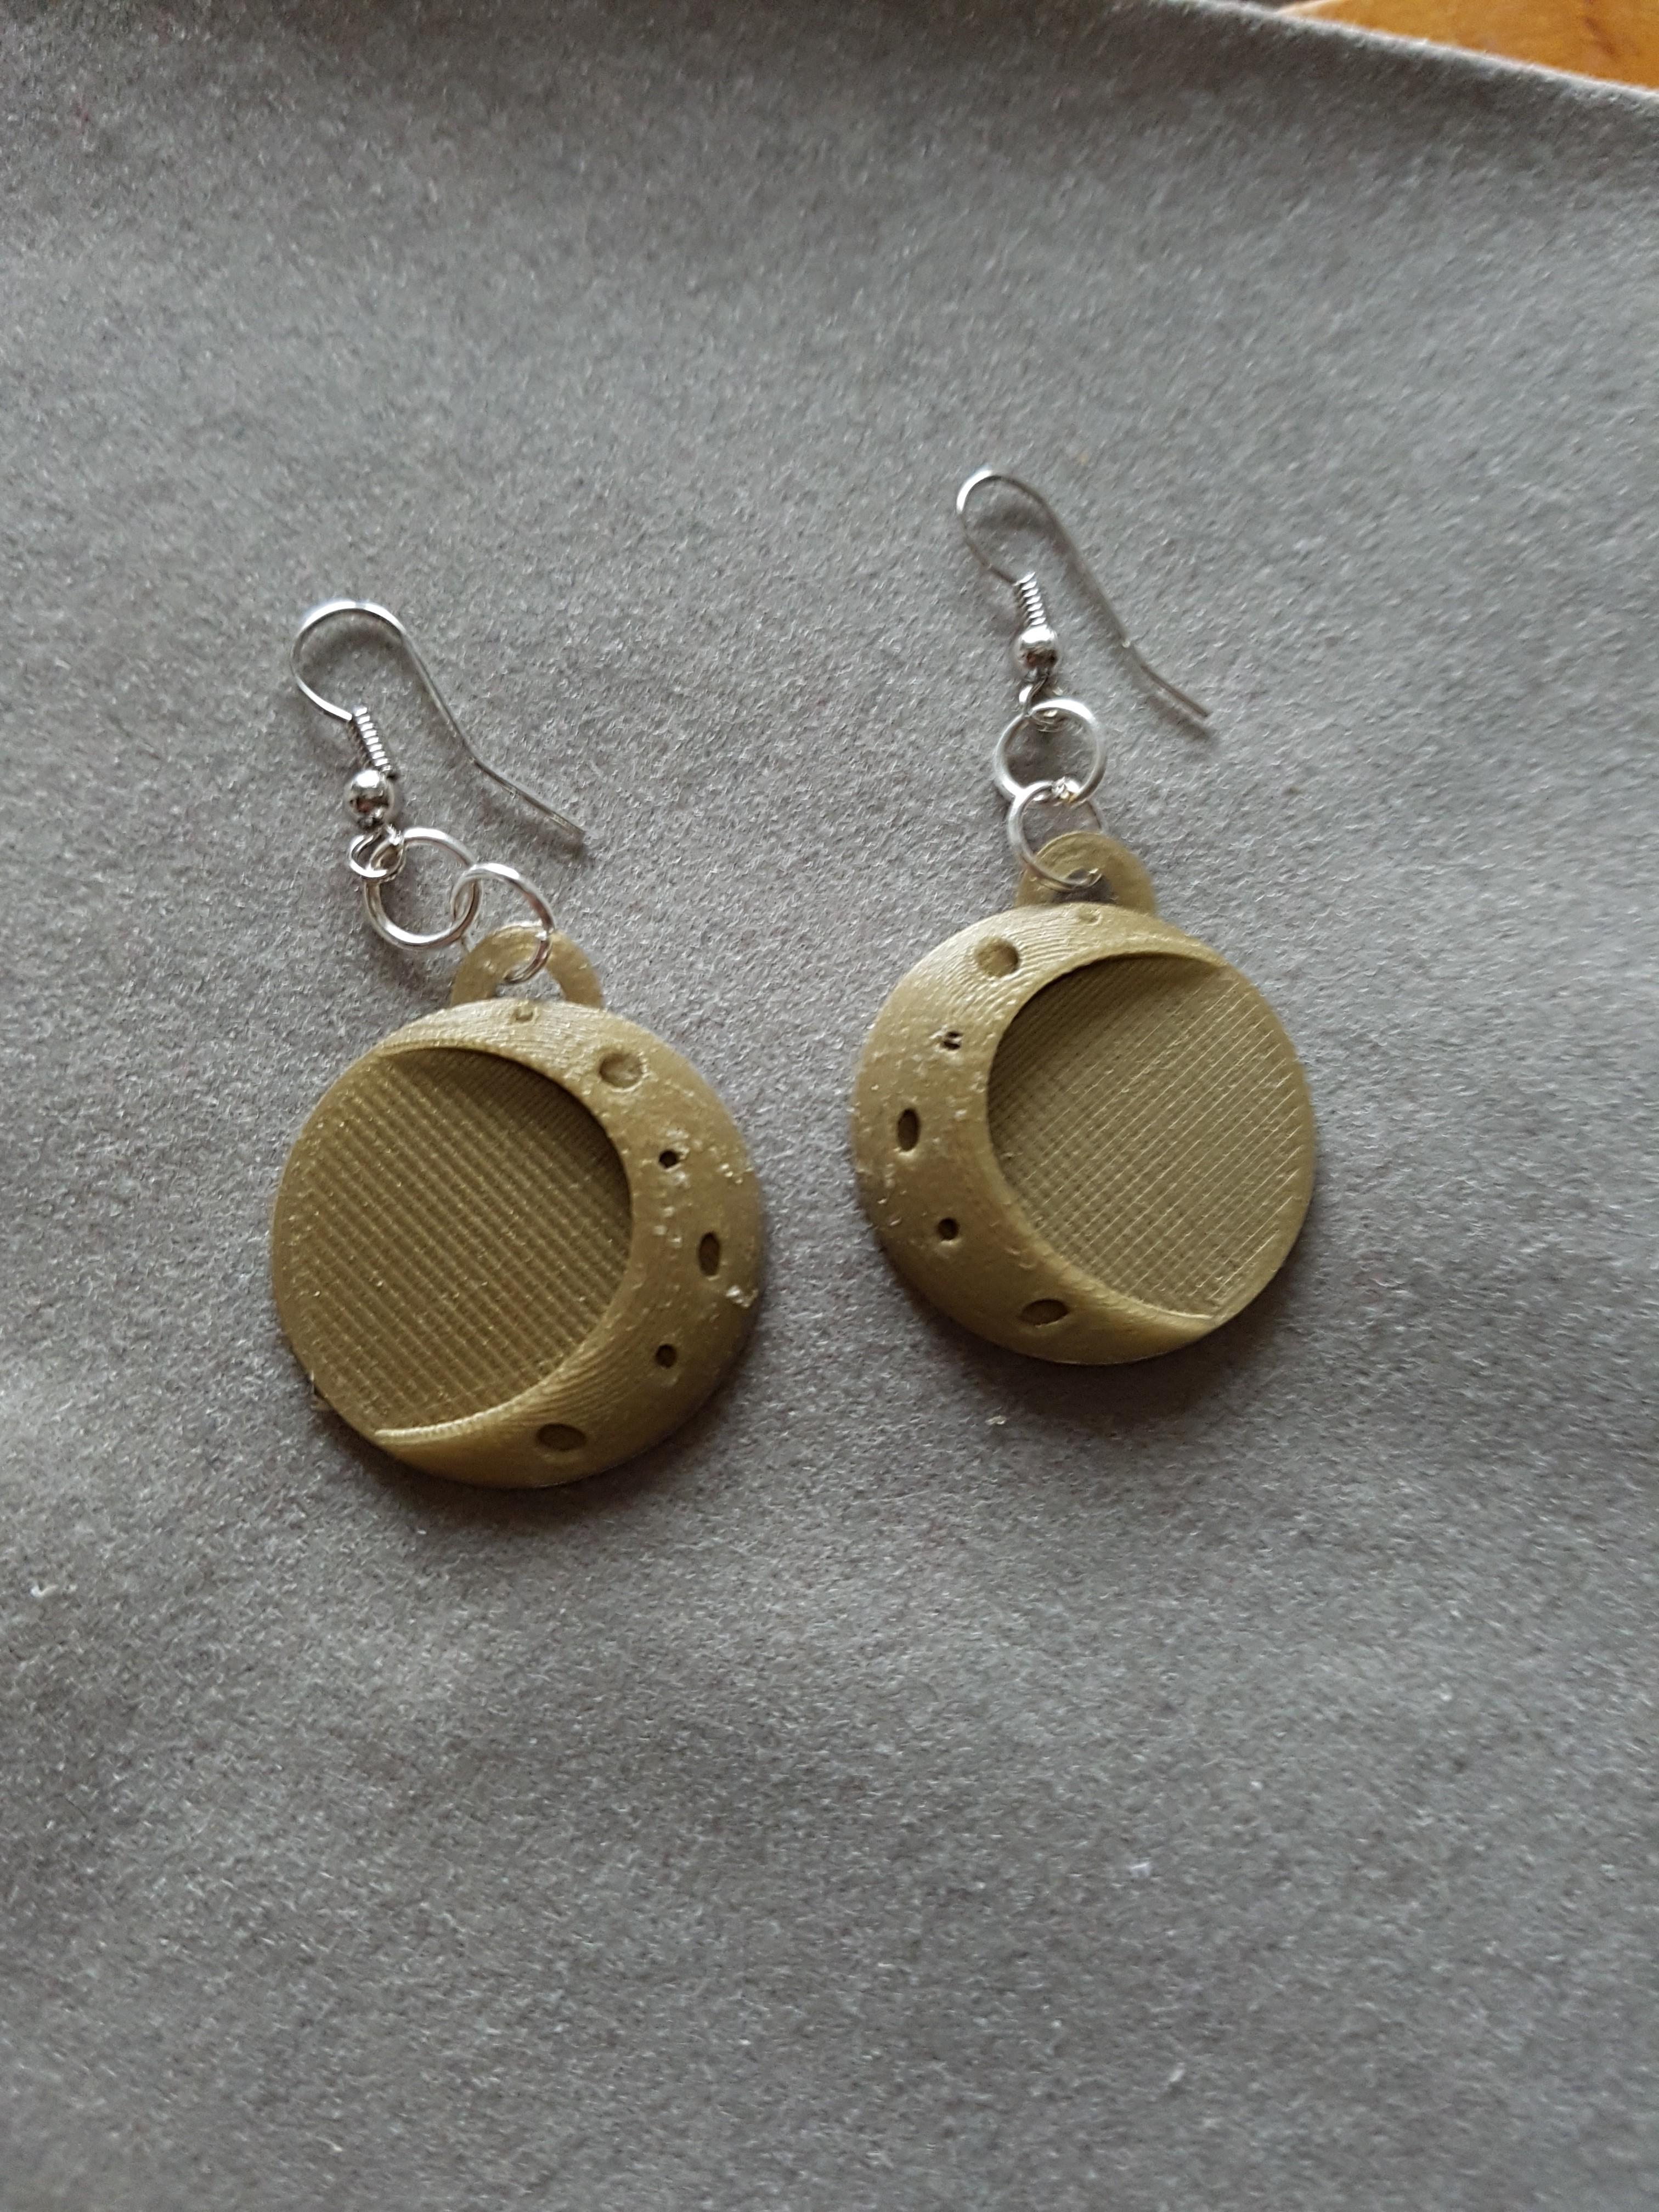 20180203_155053.jpg Download STL file 2 moon earrings • Template to 3D print, catf3d